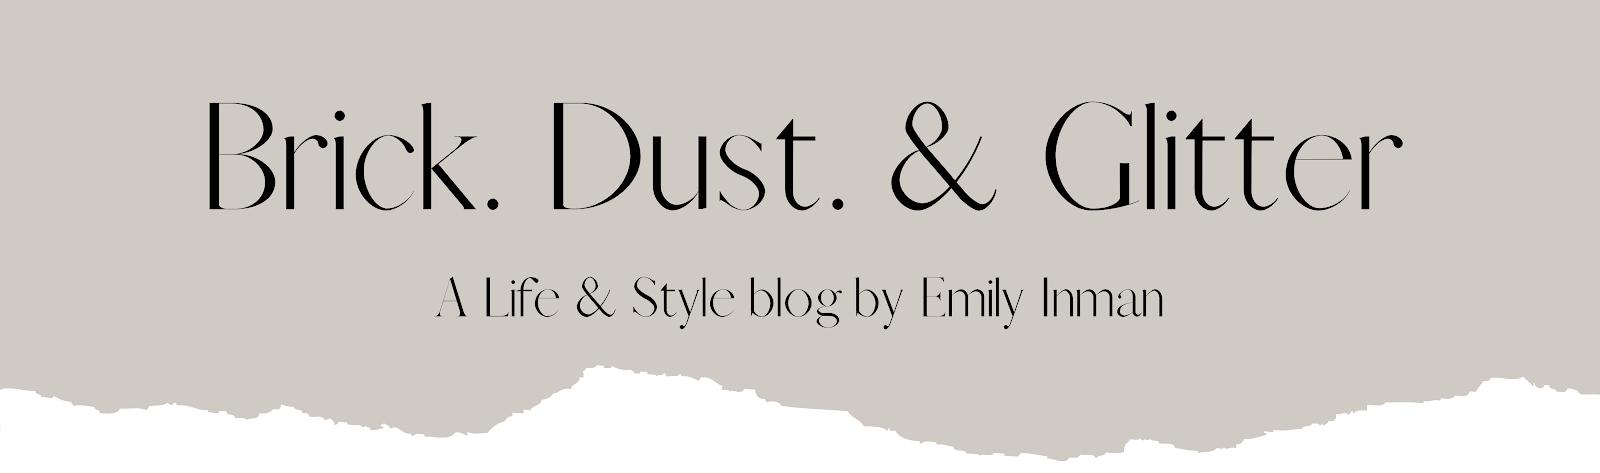 Brick Dust & Glitter